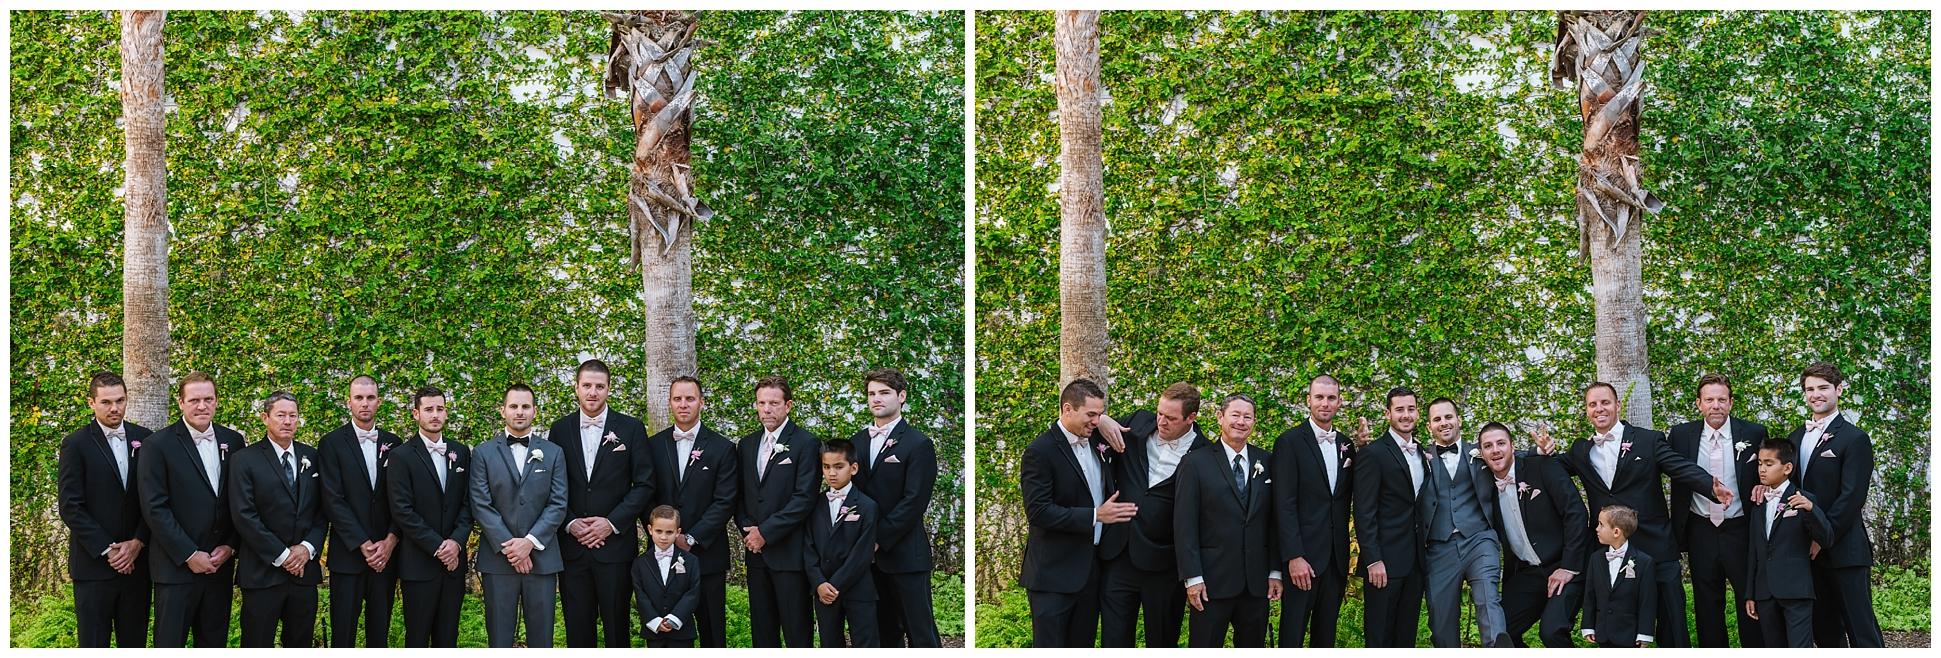 Sarasota-wedding-photographer-hyatt-regency-blush_0027.jpg